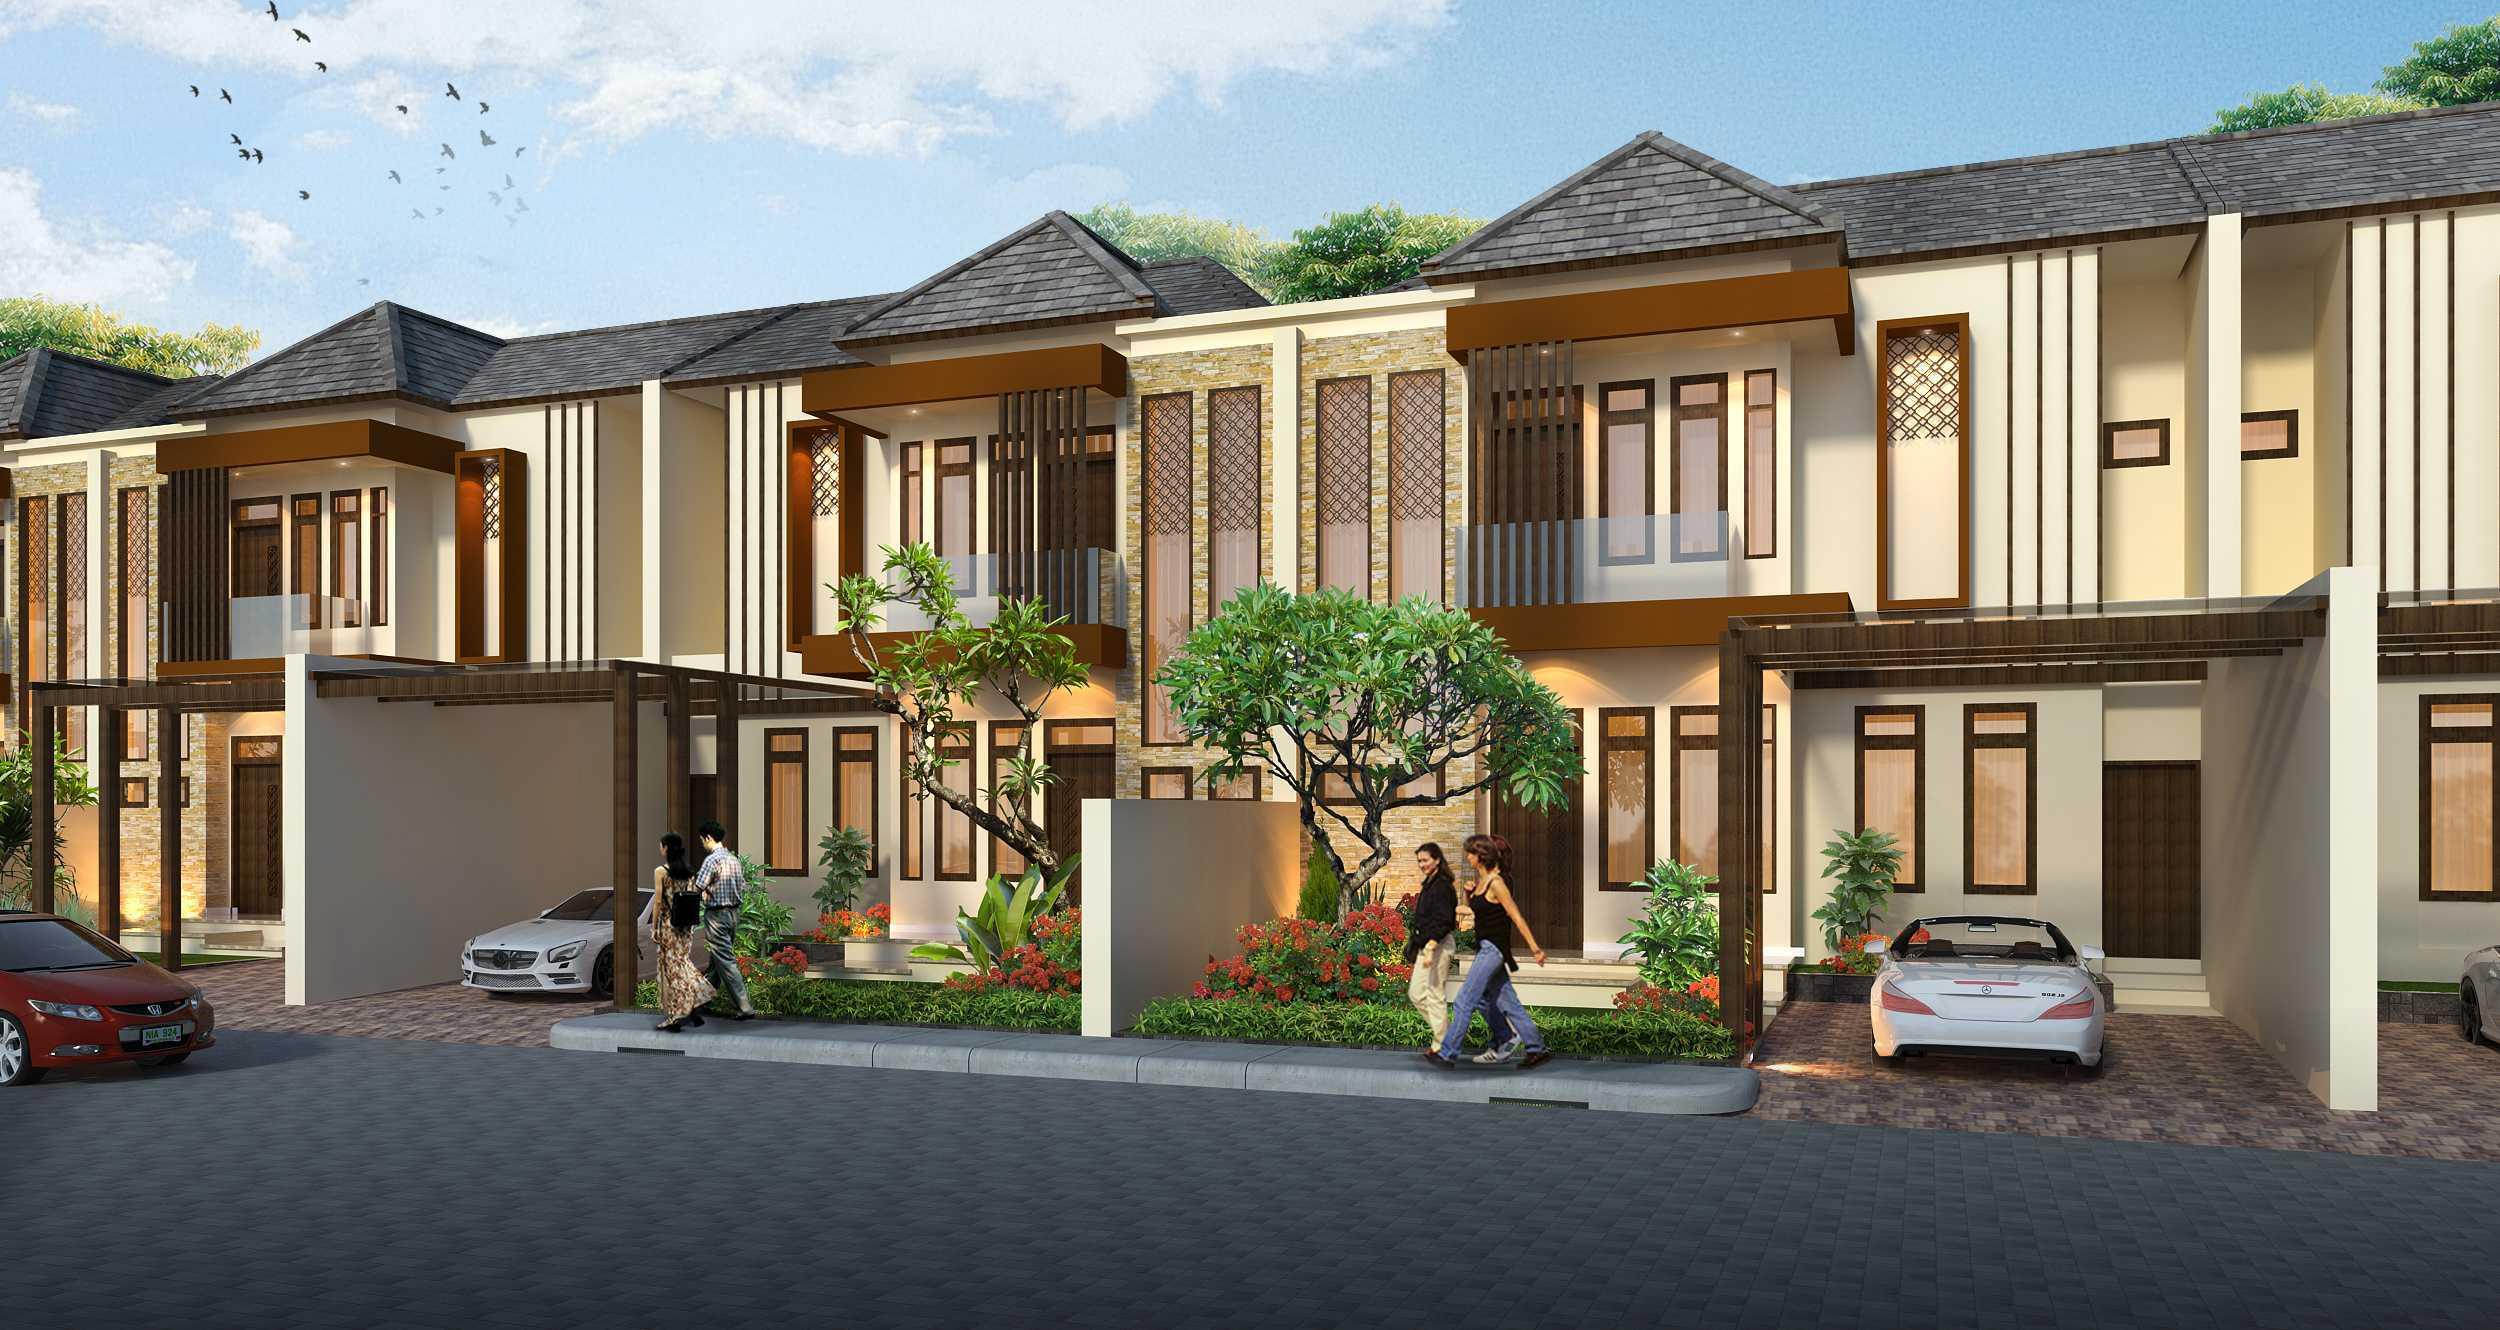 Rdesign Balikpapan Regency Metro Residence, Balikpapan Metro Residence, Balikpapan Front View   17973